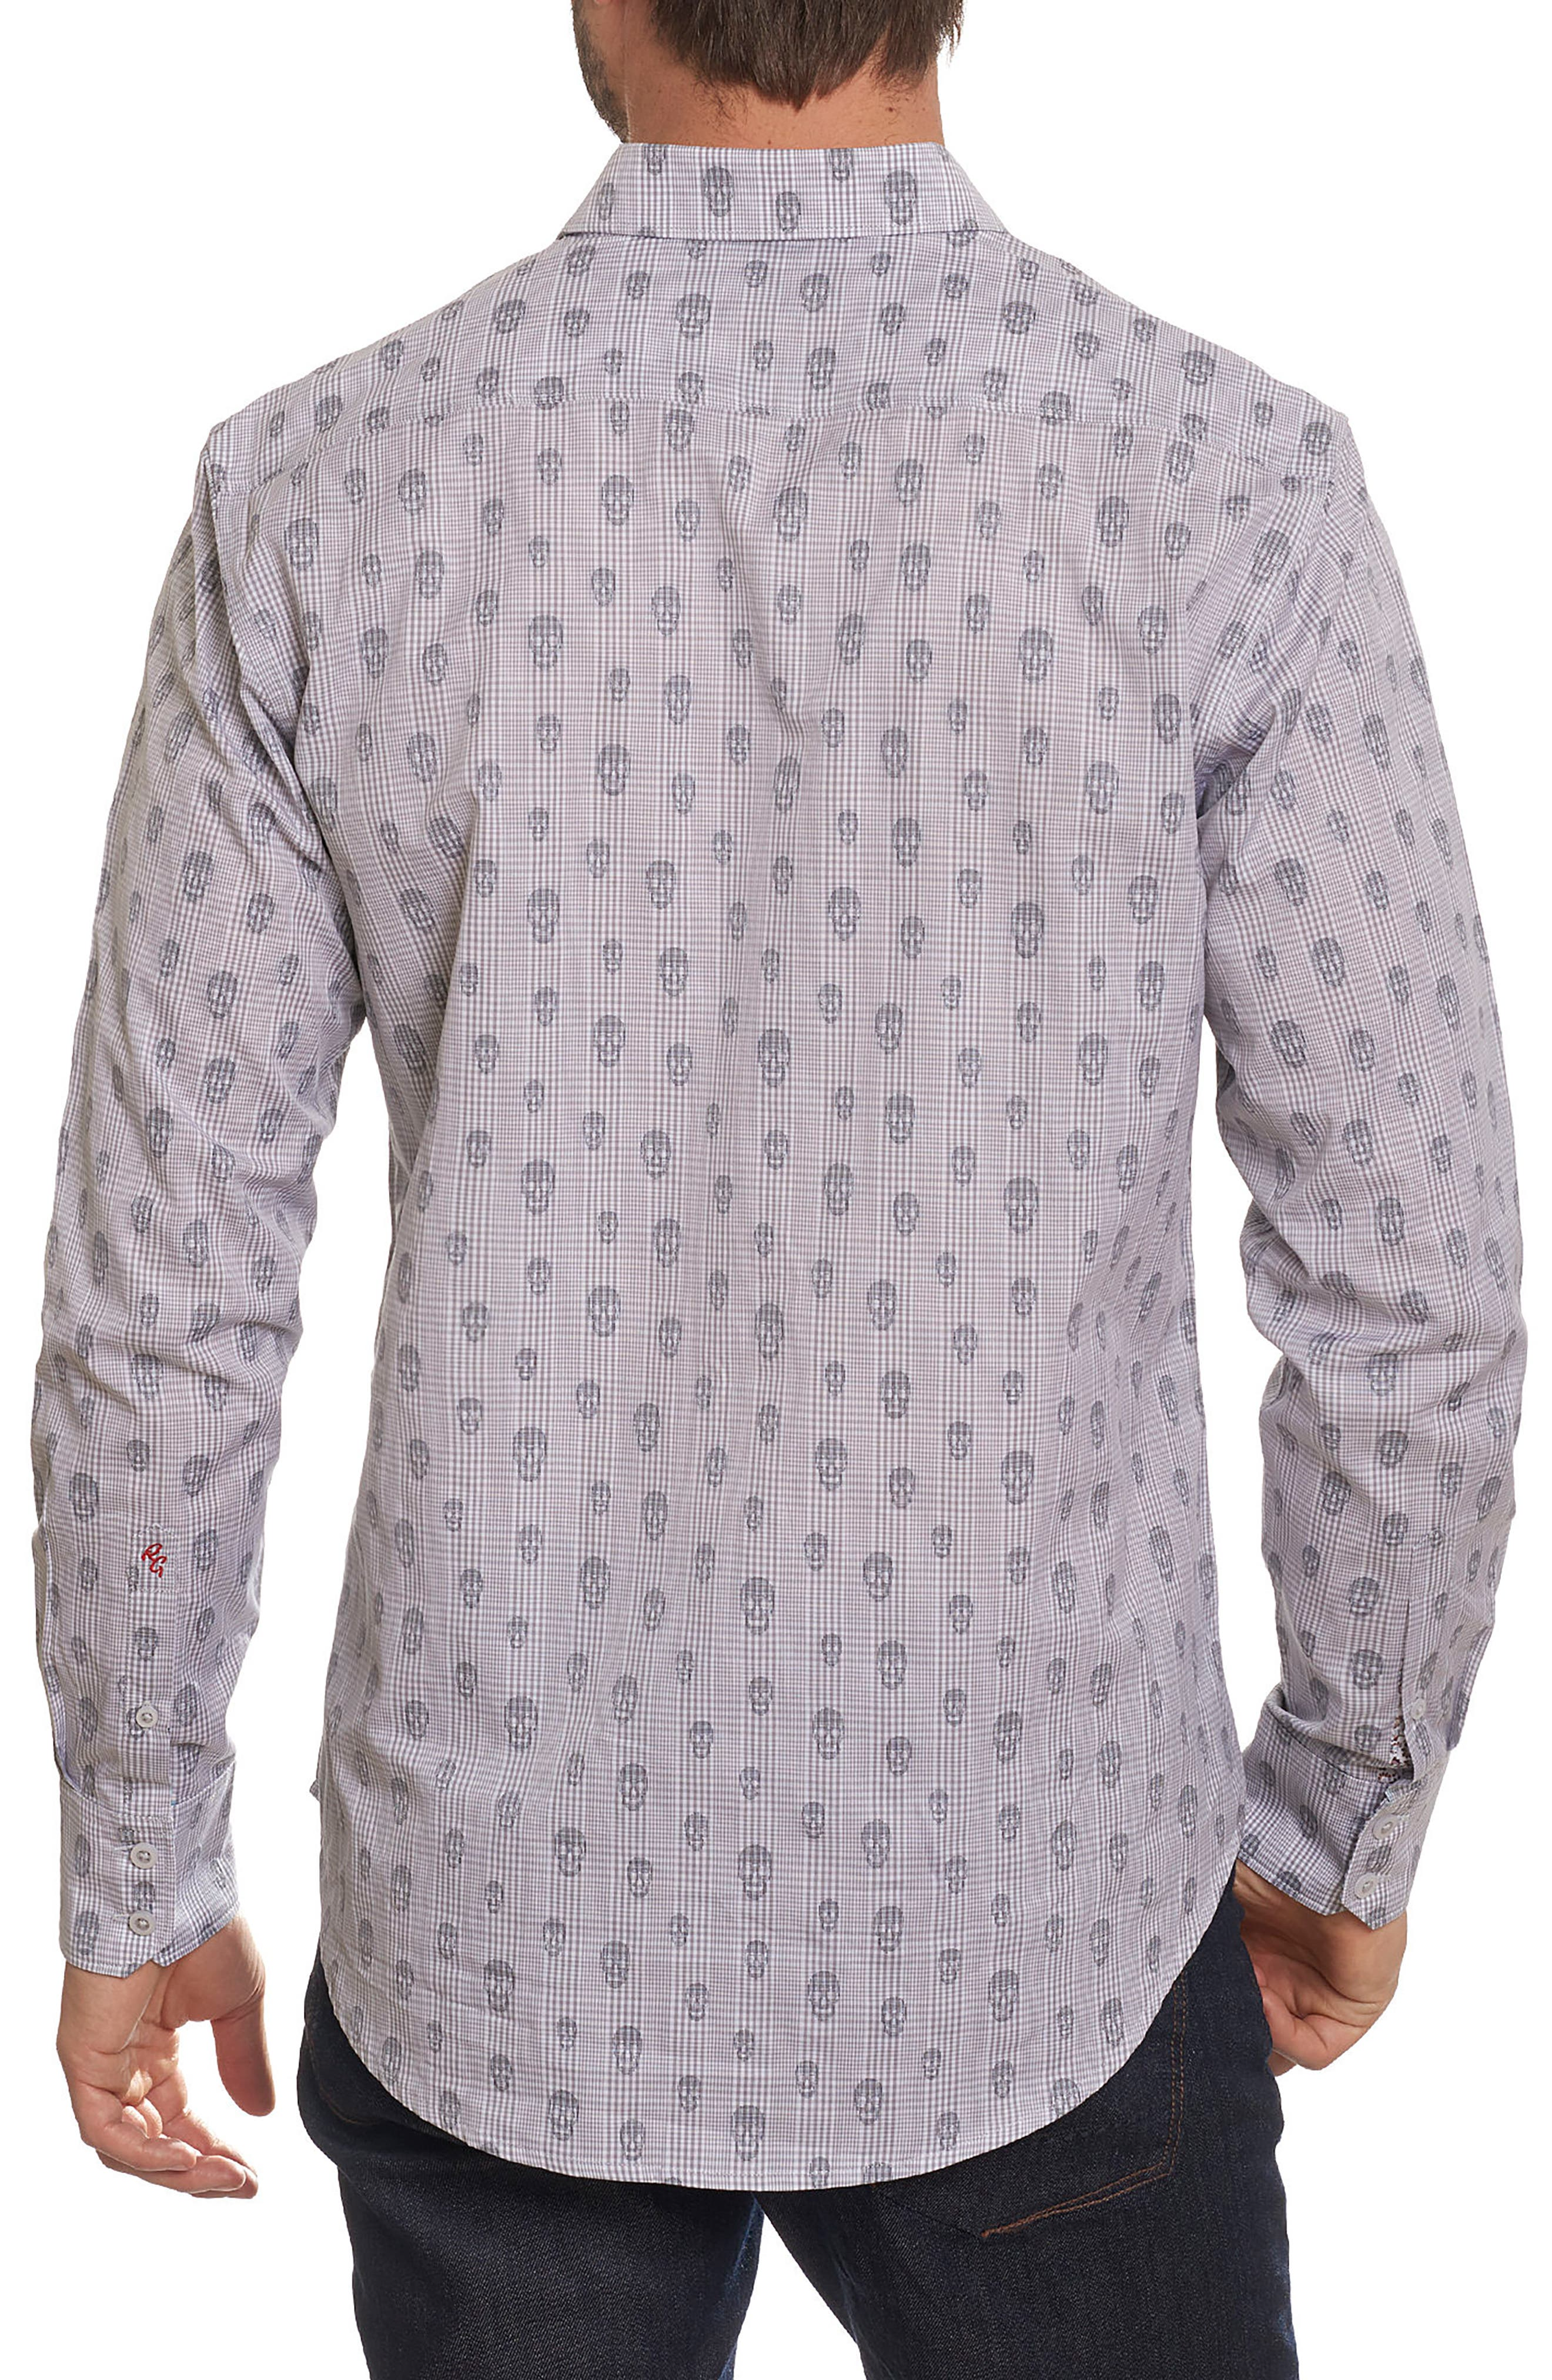 Kinderhook Classic Fit Skull Check Sport Shirt,                             Alternate thumbnail 4, color,